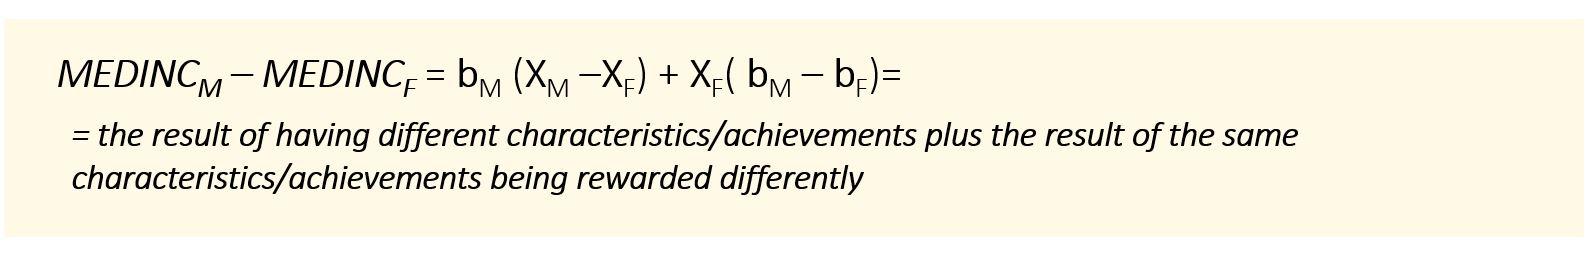 MEDINCM – MEDINCF = bM (XM –XF) + XF( bM – bF)= = the result of having different characteristics/achievements plus the result of the same characteristics/achievements being rewarded differently